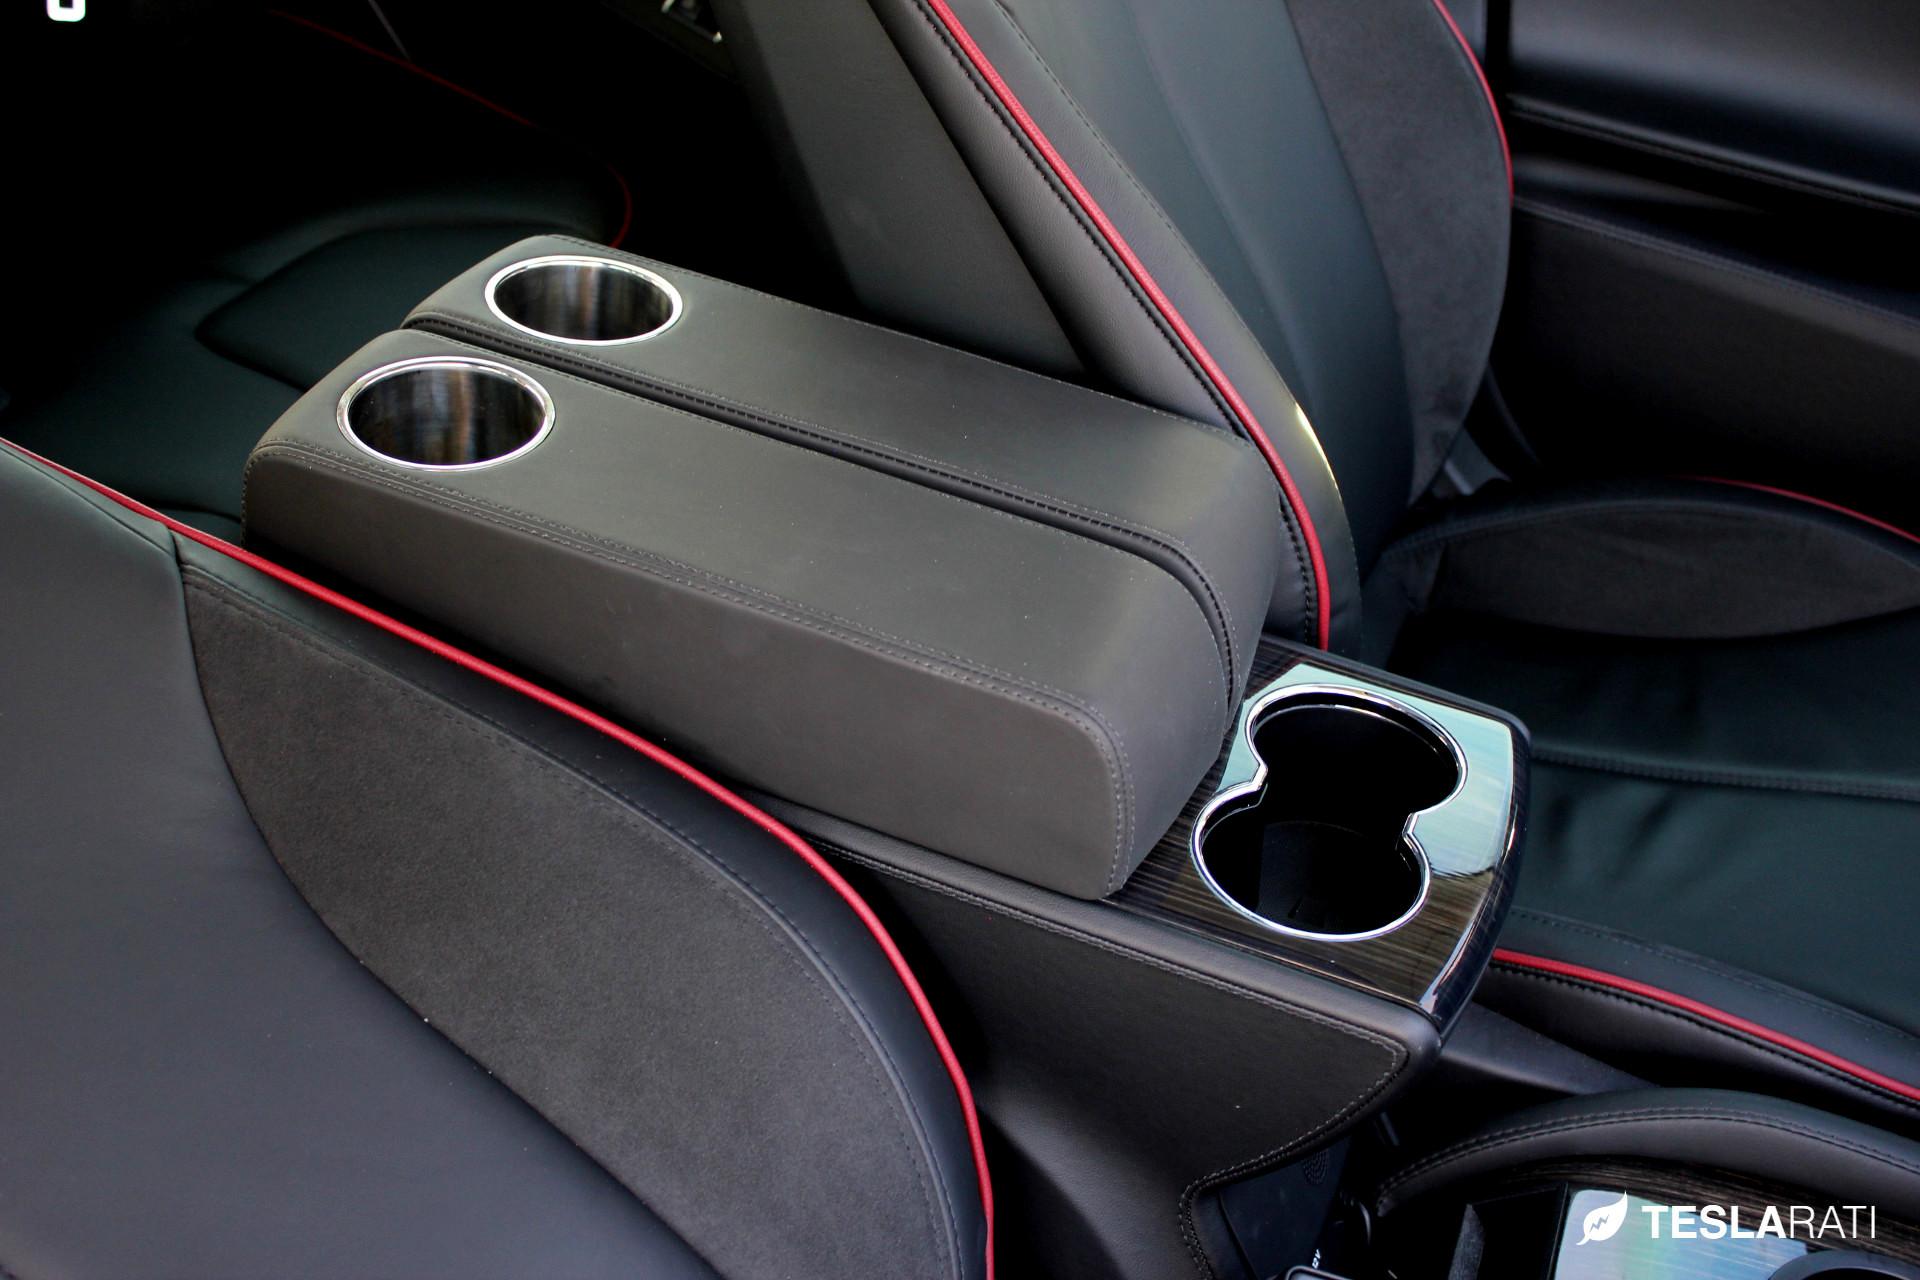 PARZ_Tesla_Rear_Seat_Cup_Holders_3